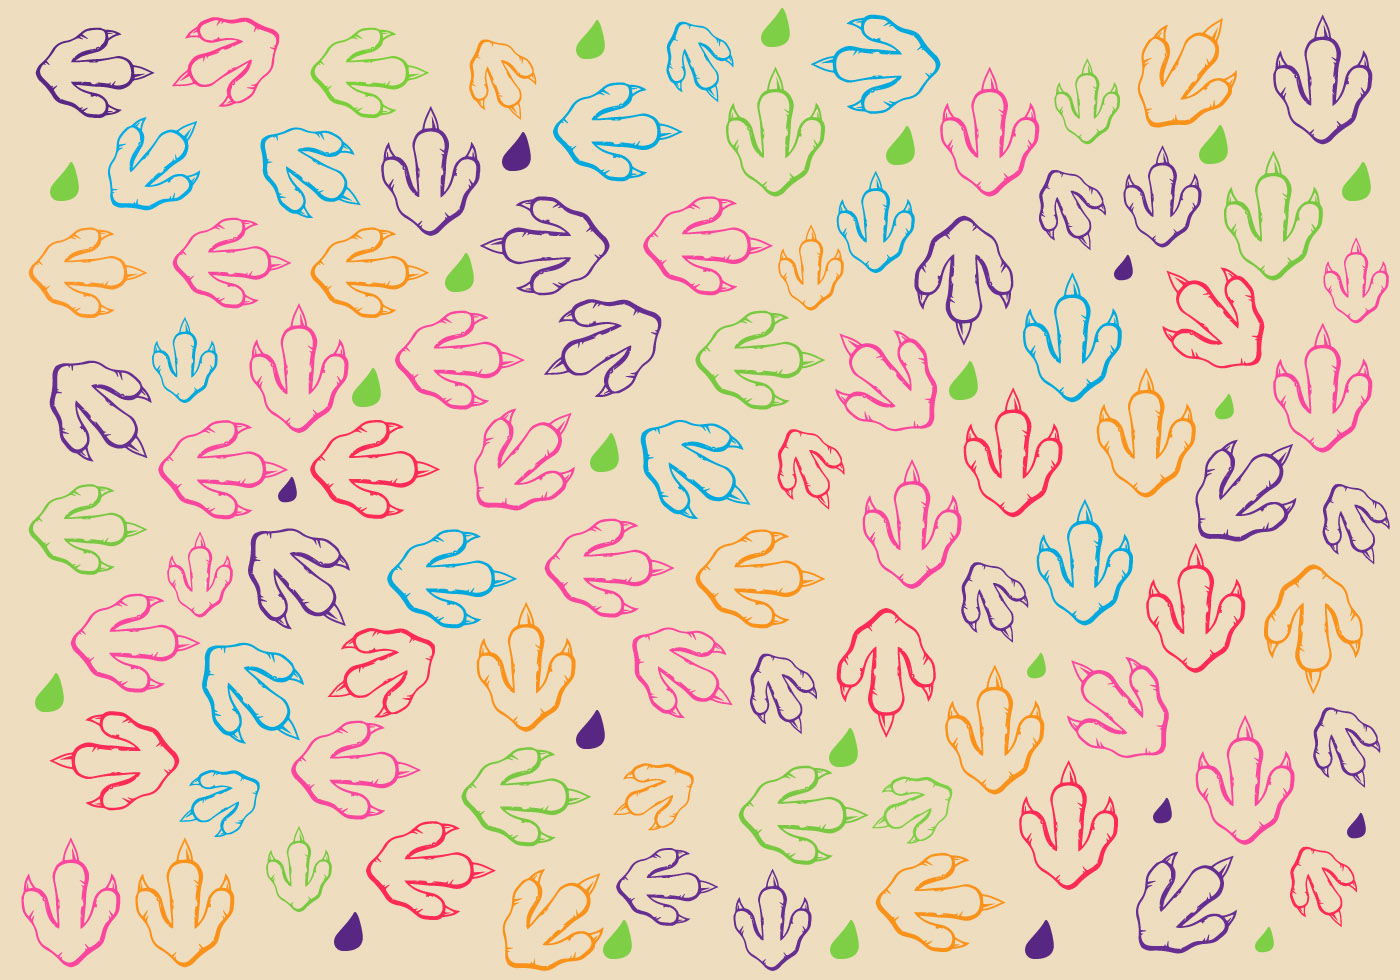 Cute Paw Print Wallpaper Free Dinosaur Footprint Pattern Vector Download Free